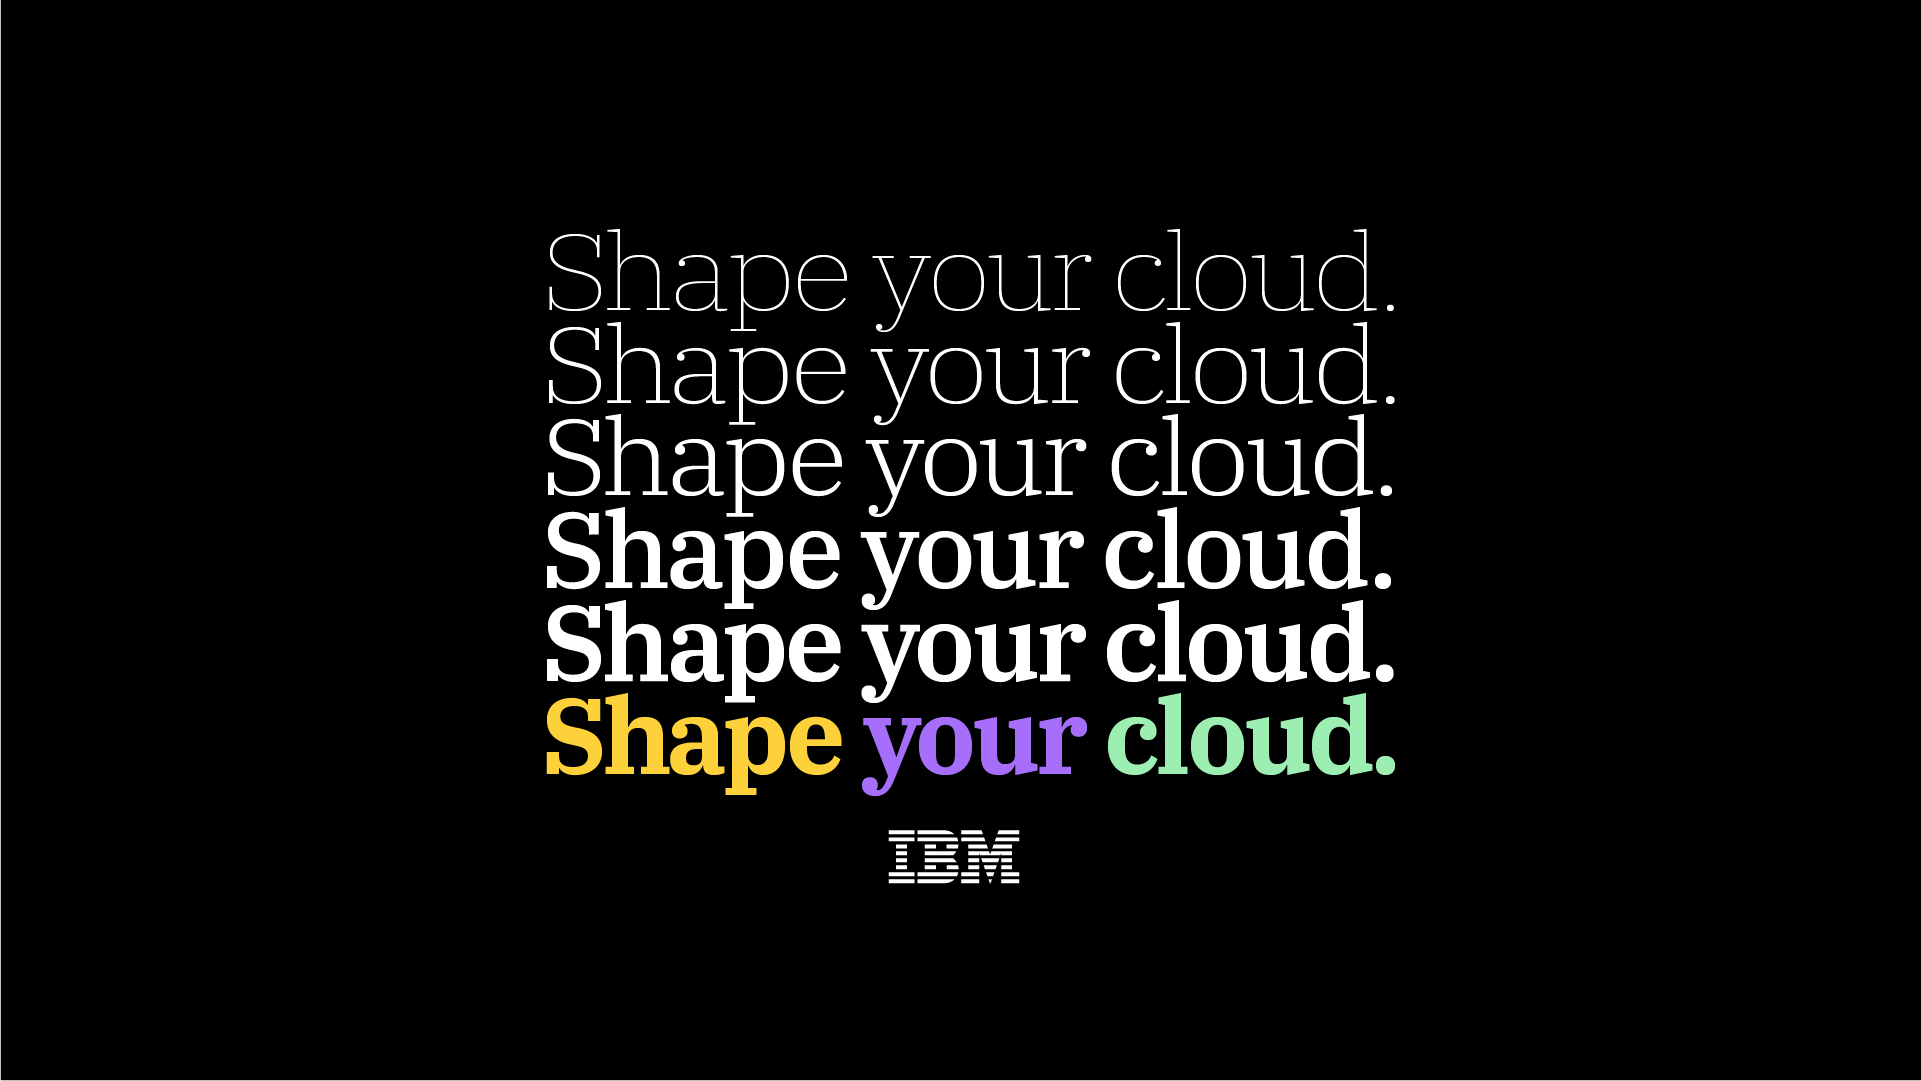 IBM_SHAPE-YOUR-CLOUD_DC_EDITS_BH_proceso_IBM-process-13.jpg